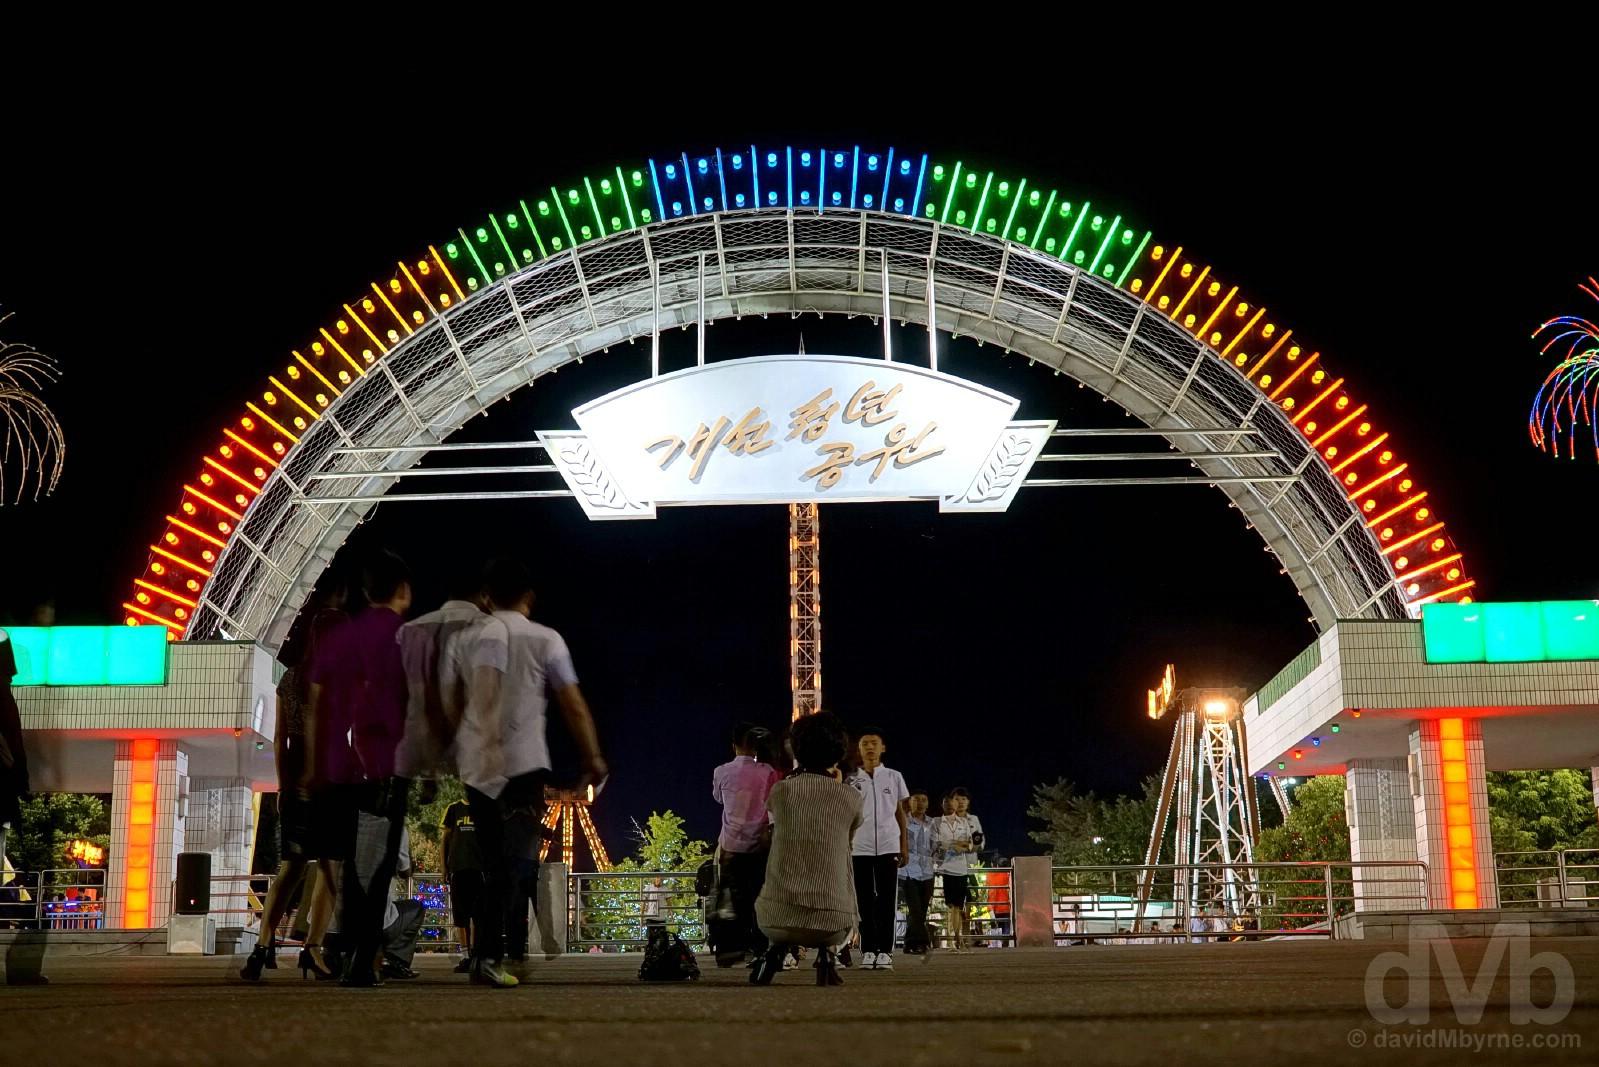 Kaeson Funfair, Pyongyang, North Korea. August 15, 2017.